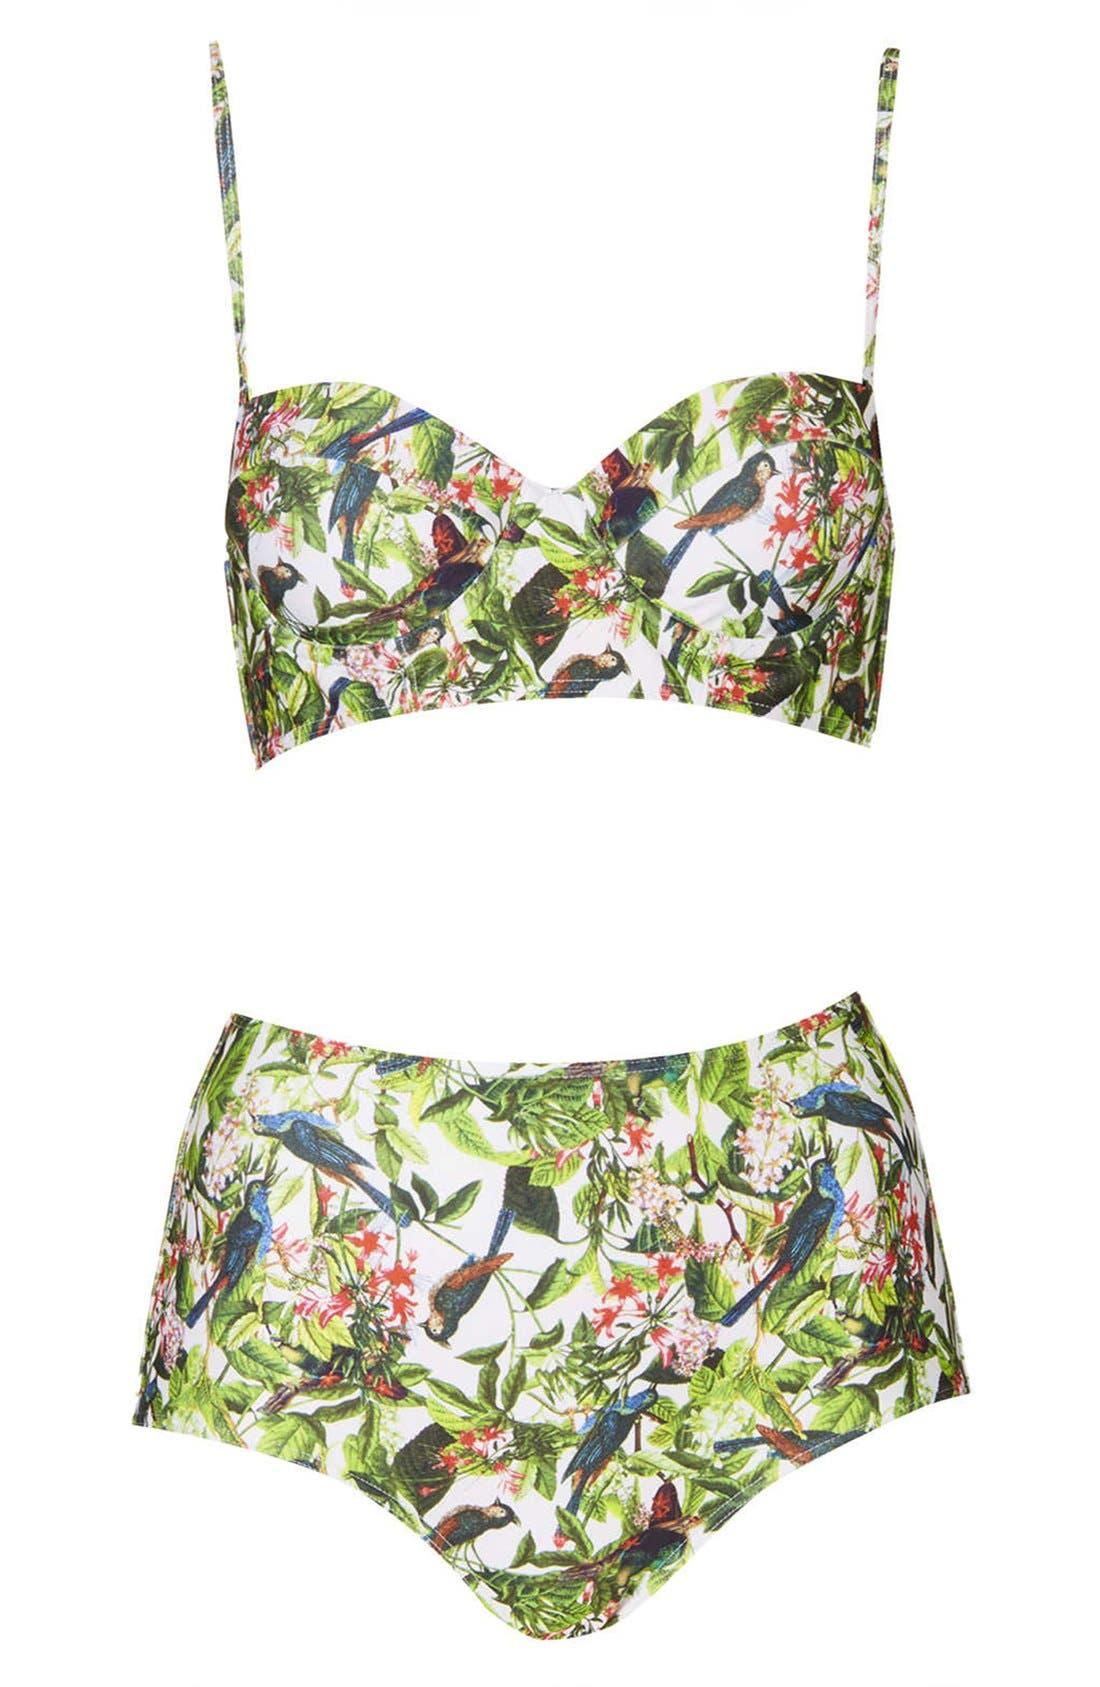 Alternate Image 1 Selected - Topshop Leaf Print High Rise Bikini